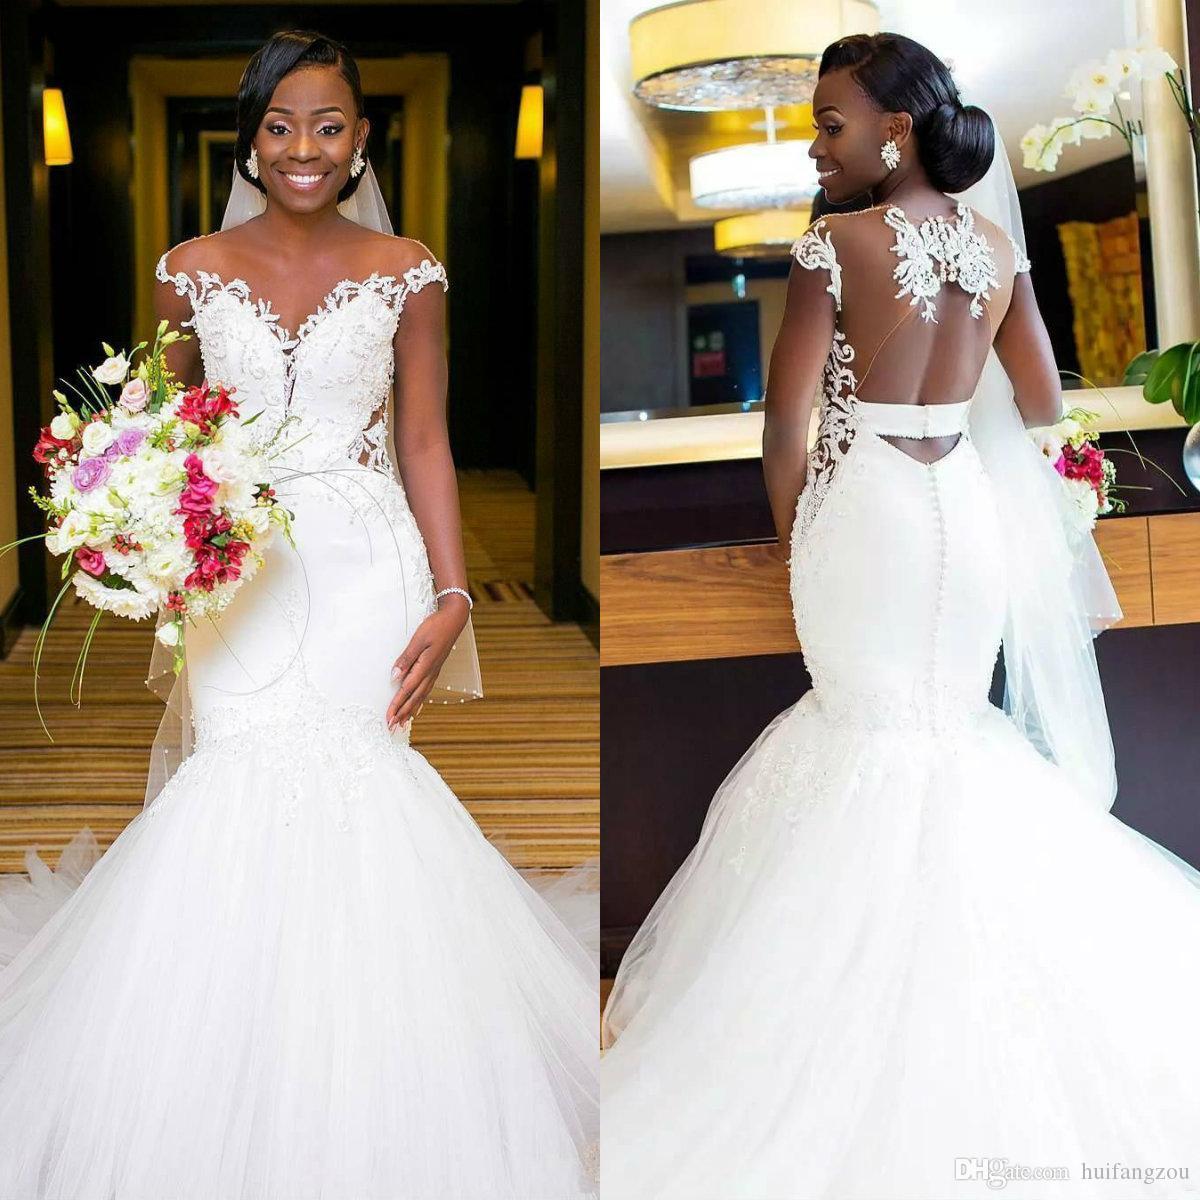 307b13a7277 Latest African Mermaid Wedding Dresses Cap Sleeve Lace Applique Beaded  Tulle Beach Wedding Dress Plus Size Robe De Mariée Cheap Bridal Gowns  Discount ...